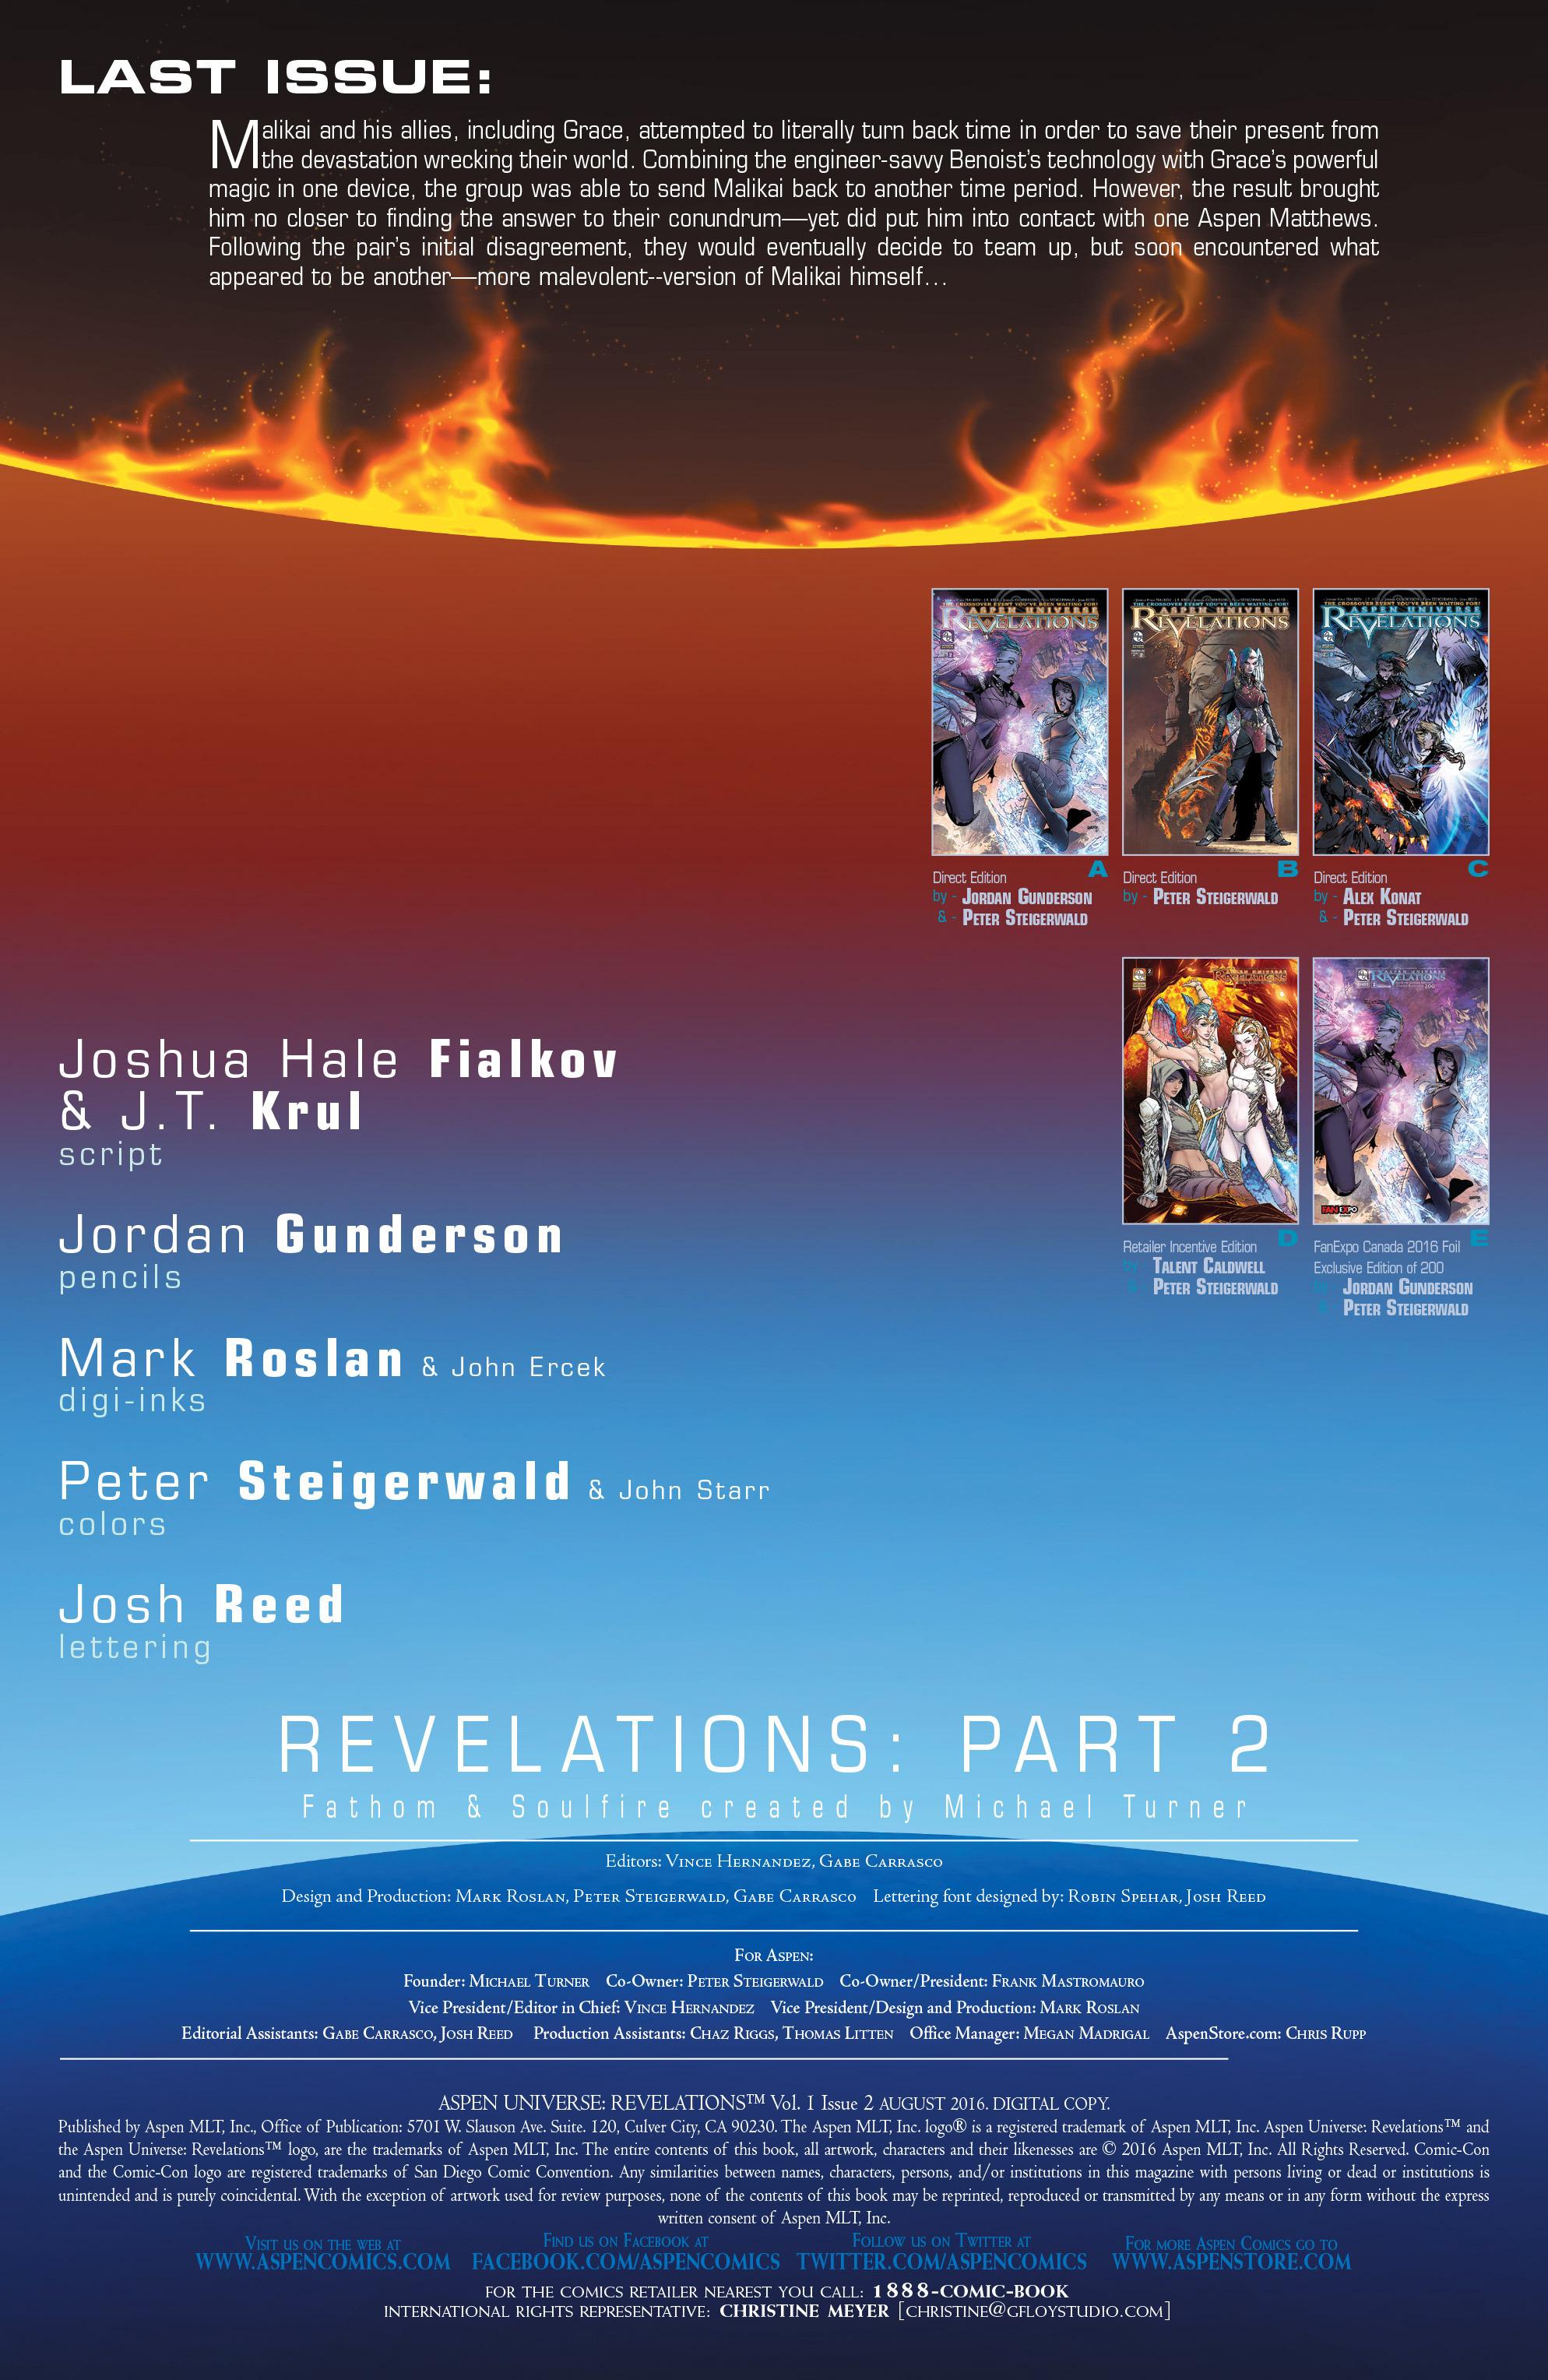 Read online Aspen Universe: Revelations comic -  Issue #2 - 4